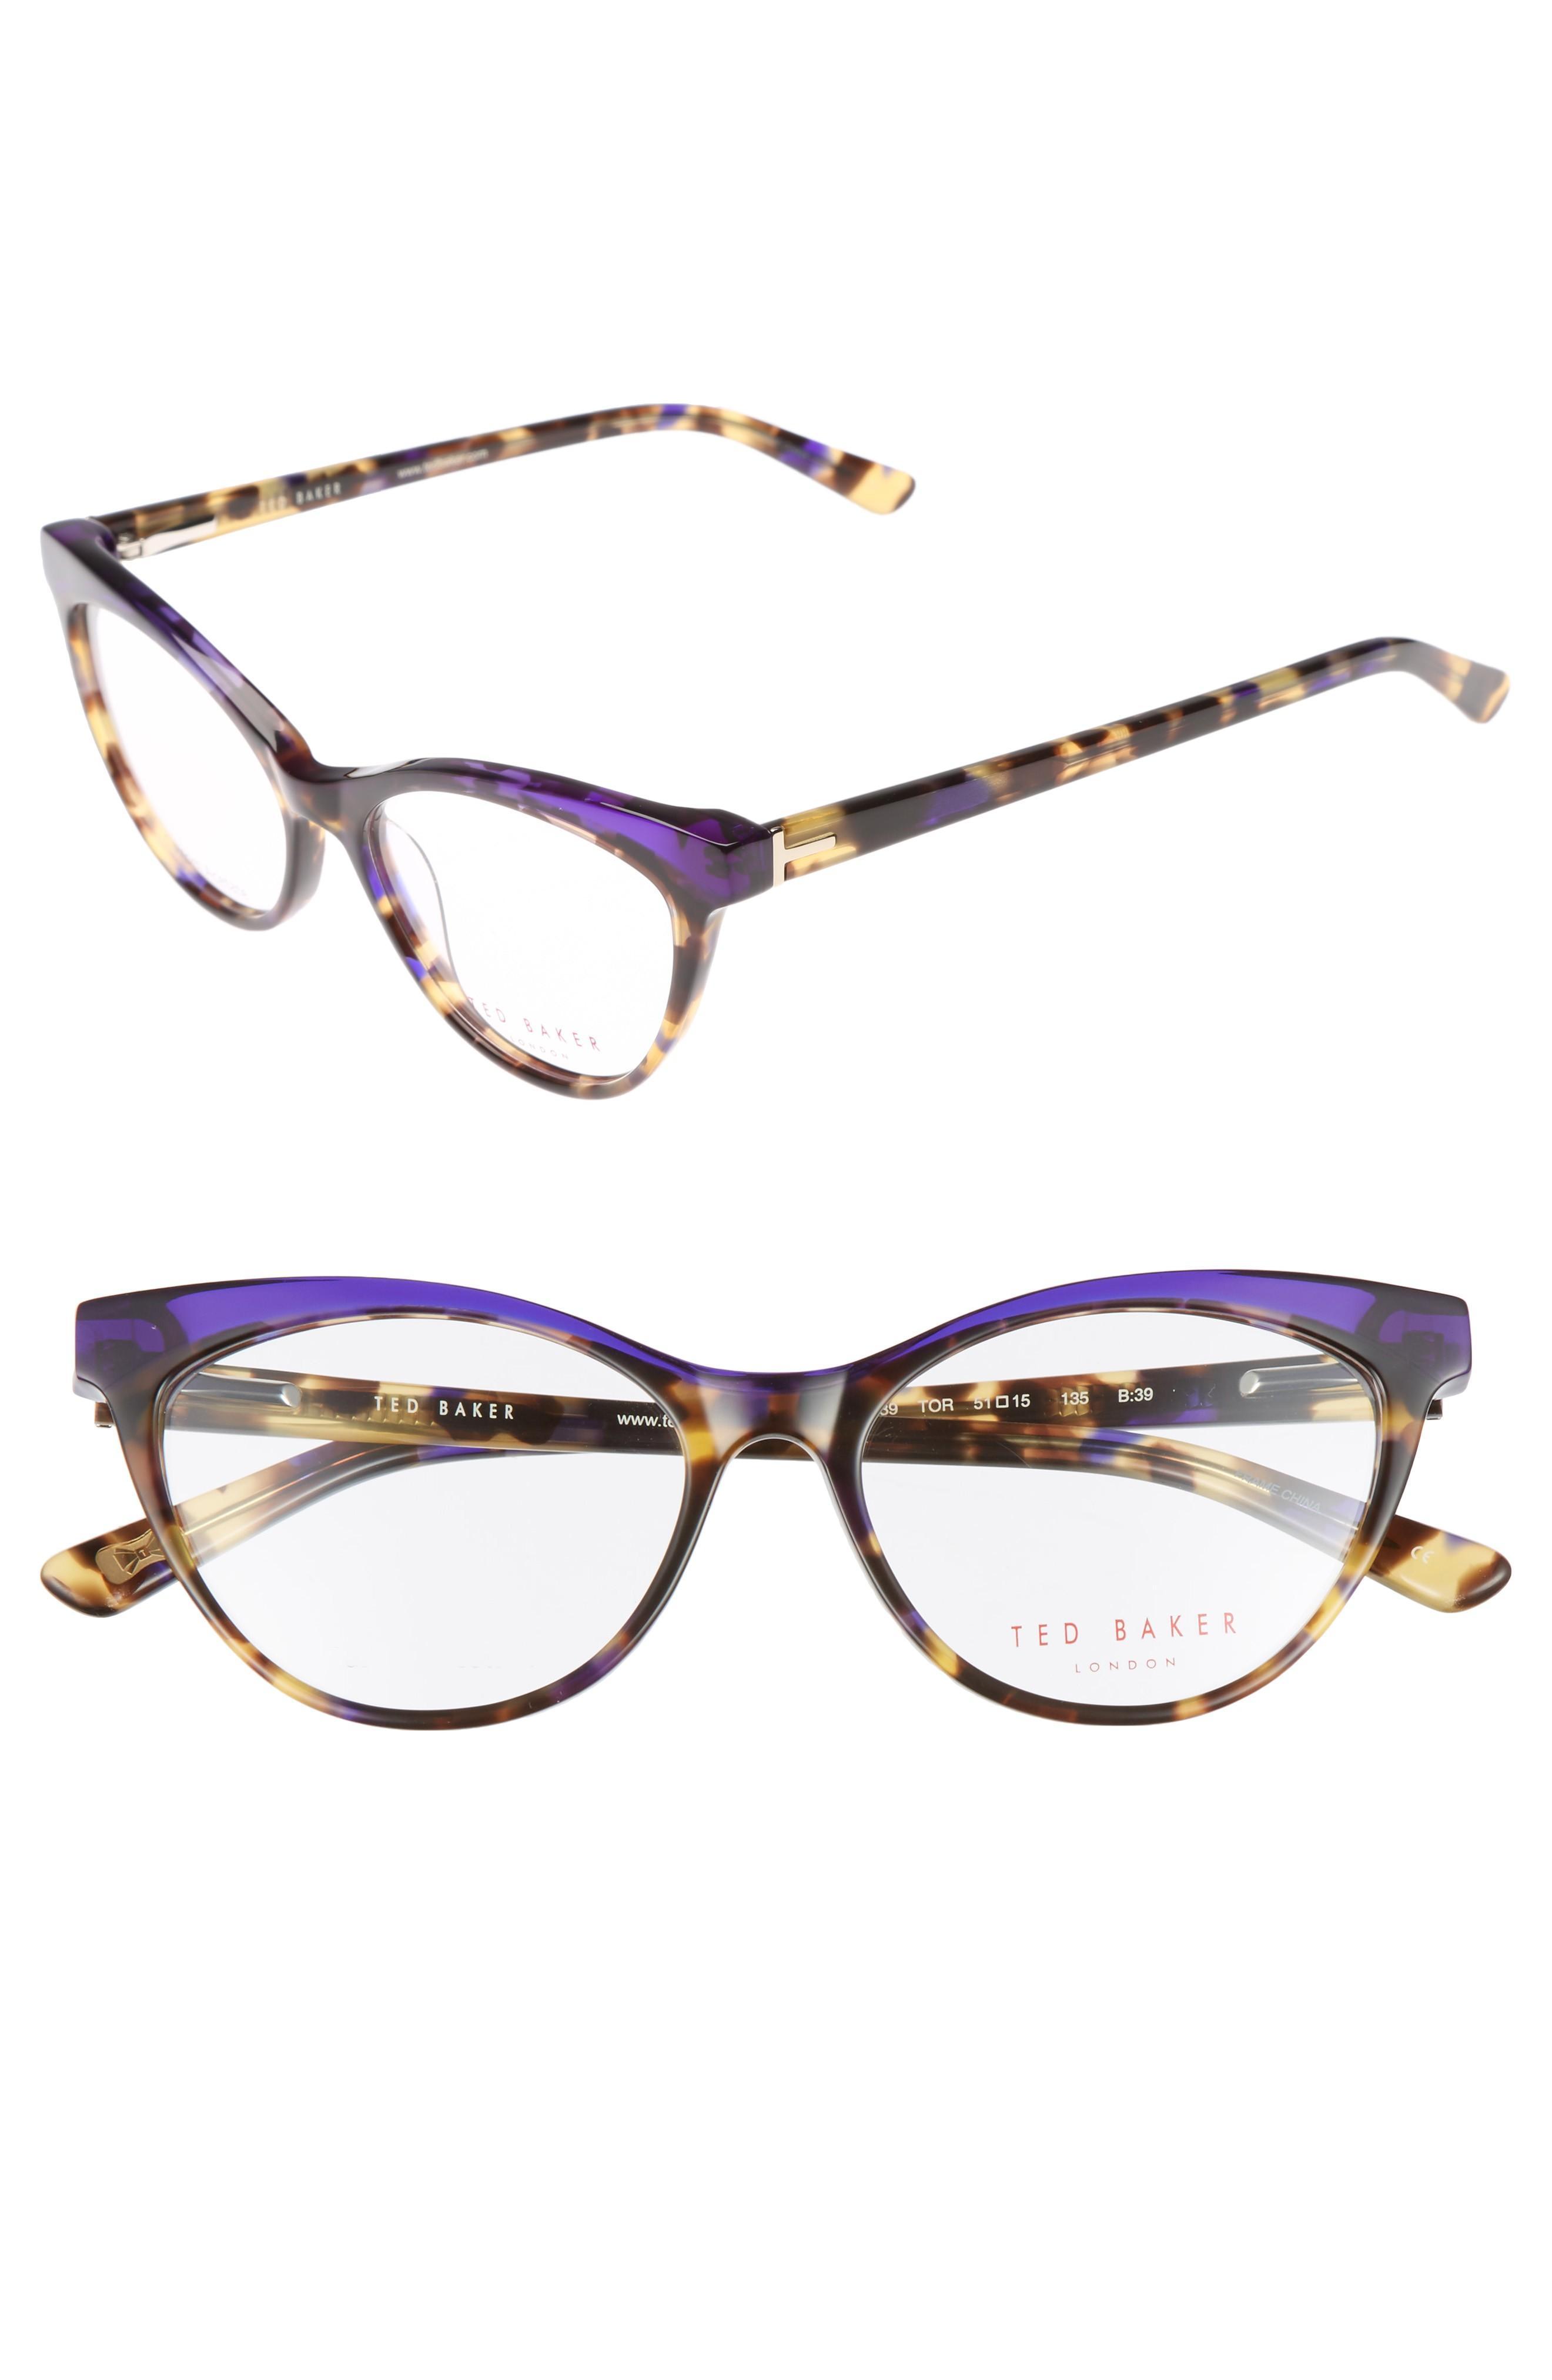 1edf51dd3c Ted Baker 51Mm Optical Cat Eye Glasses - Brown